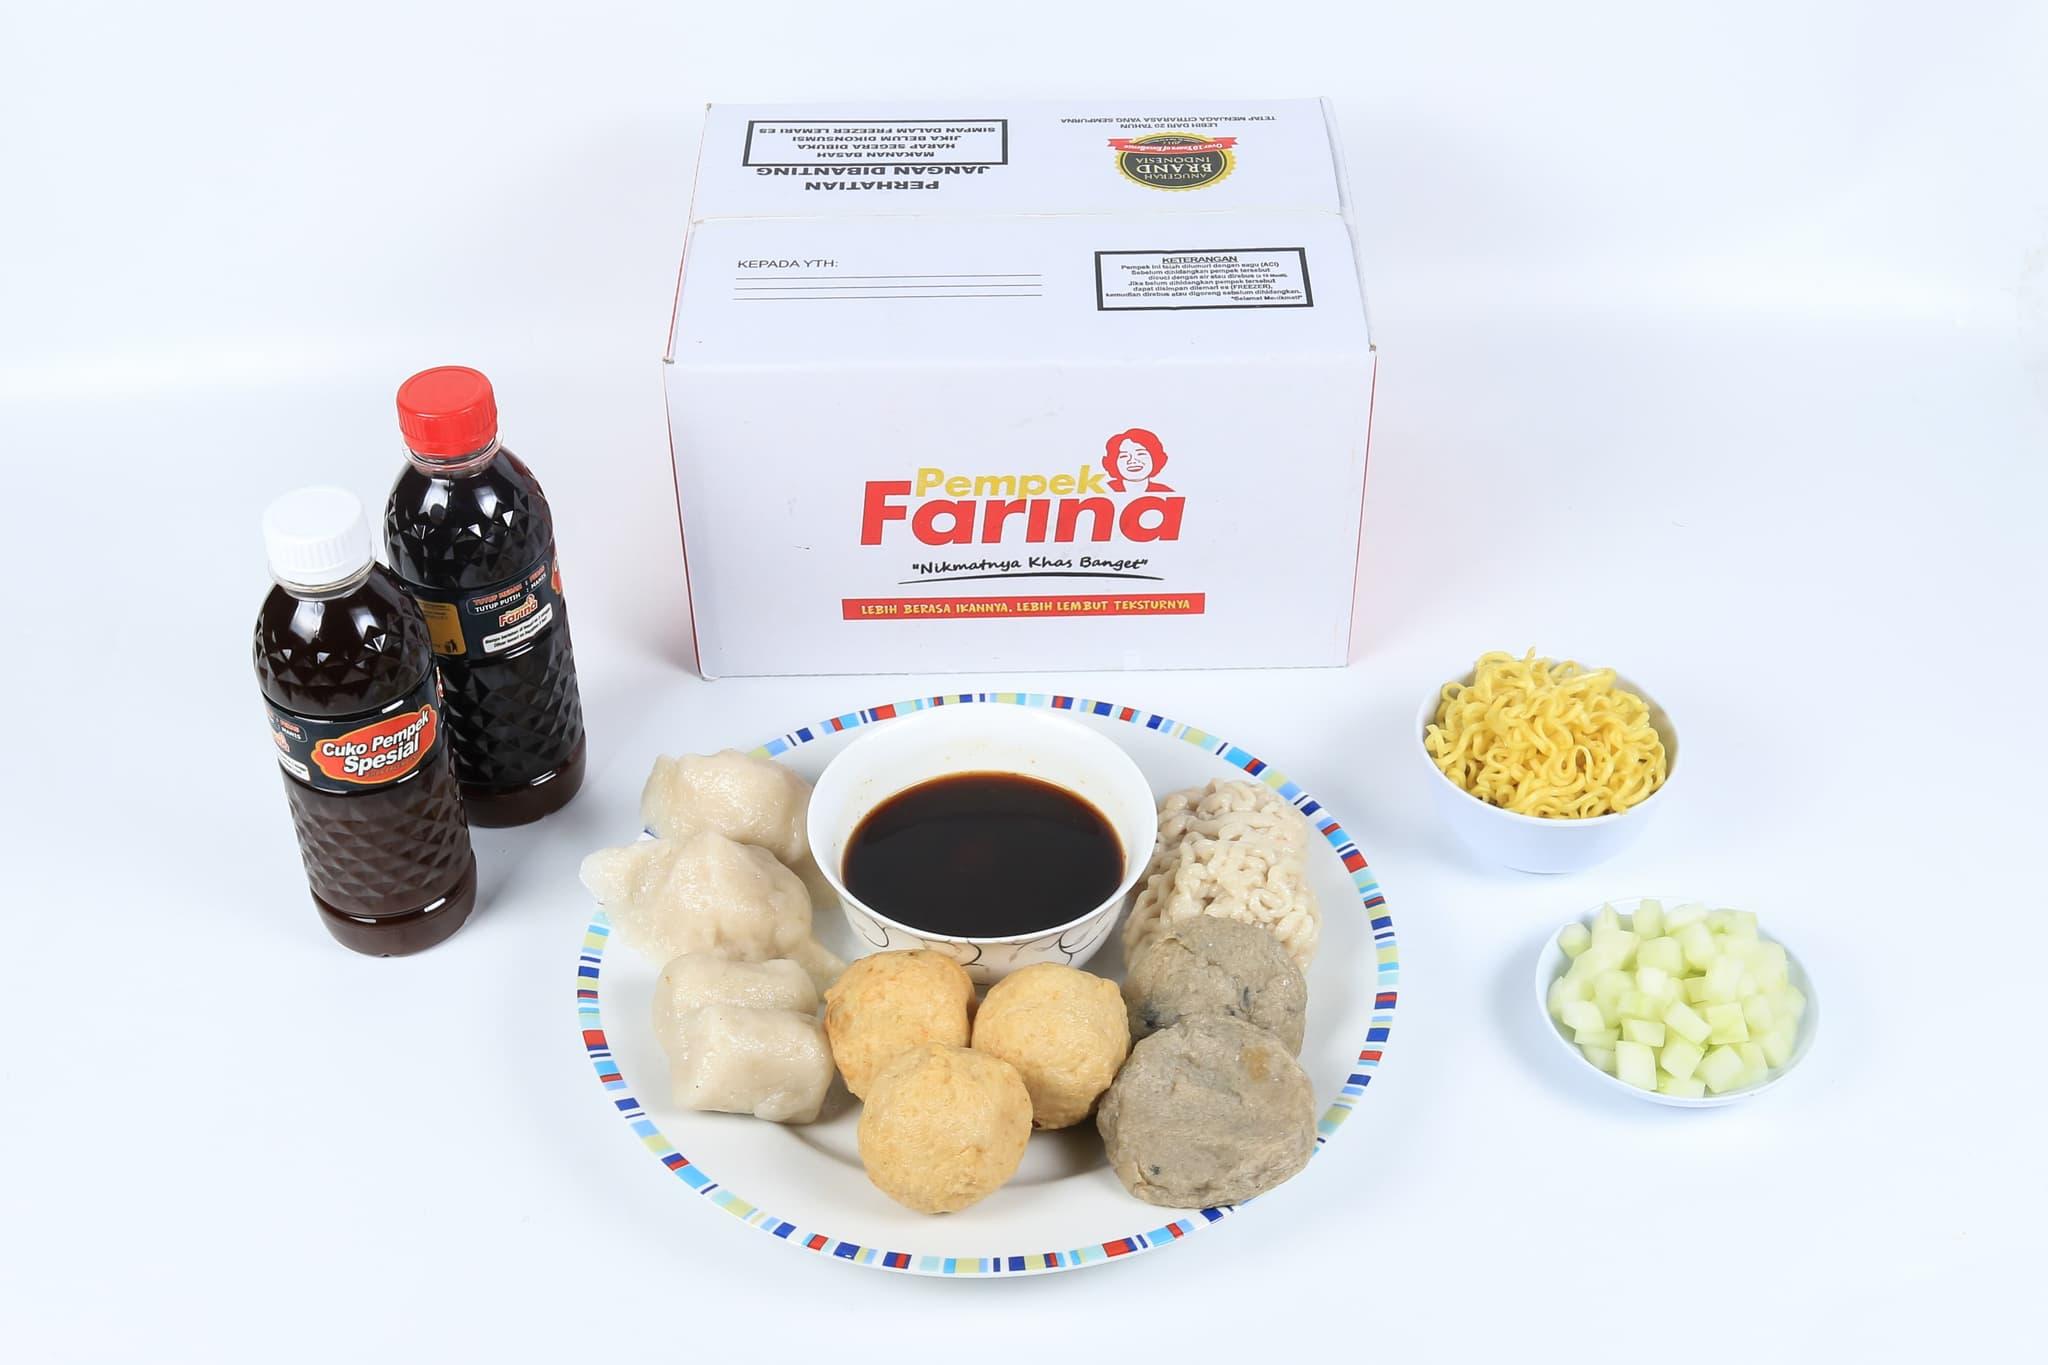 Pempek Farina Paket A5 - Blanja.com